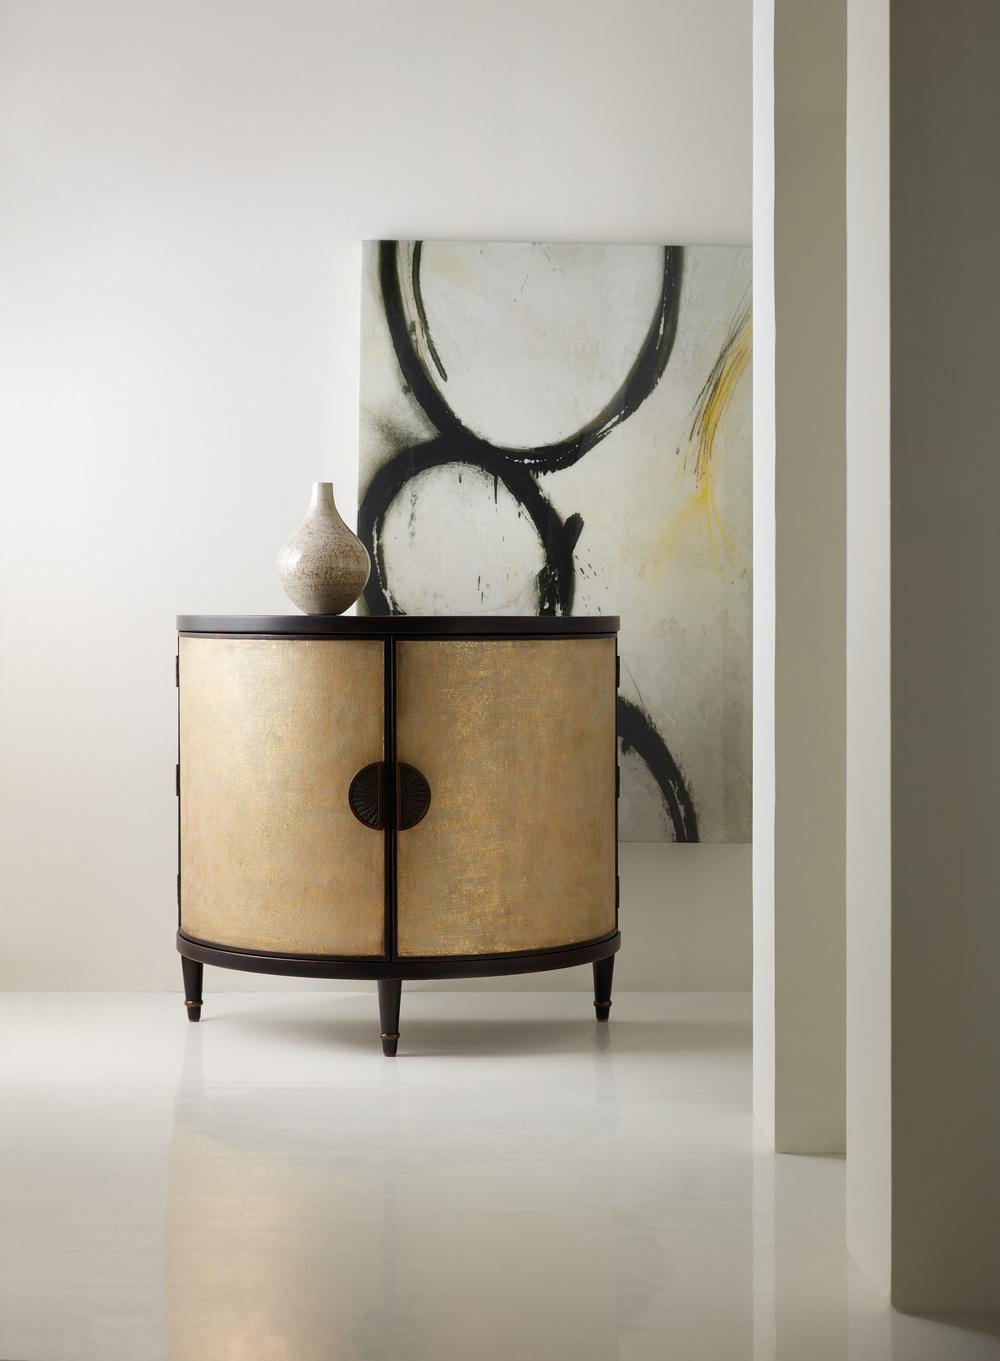 Hooker Furniture - Em Demilune Accent Chest